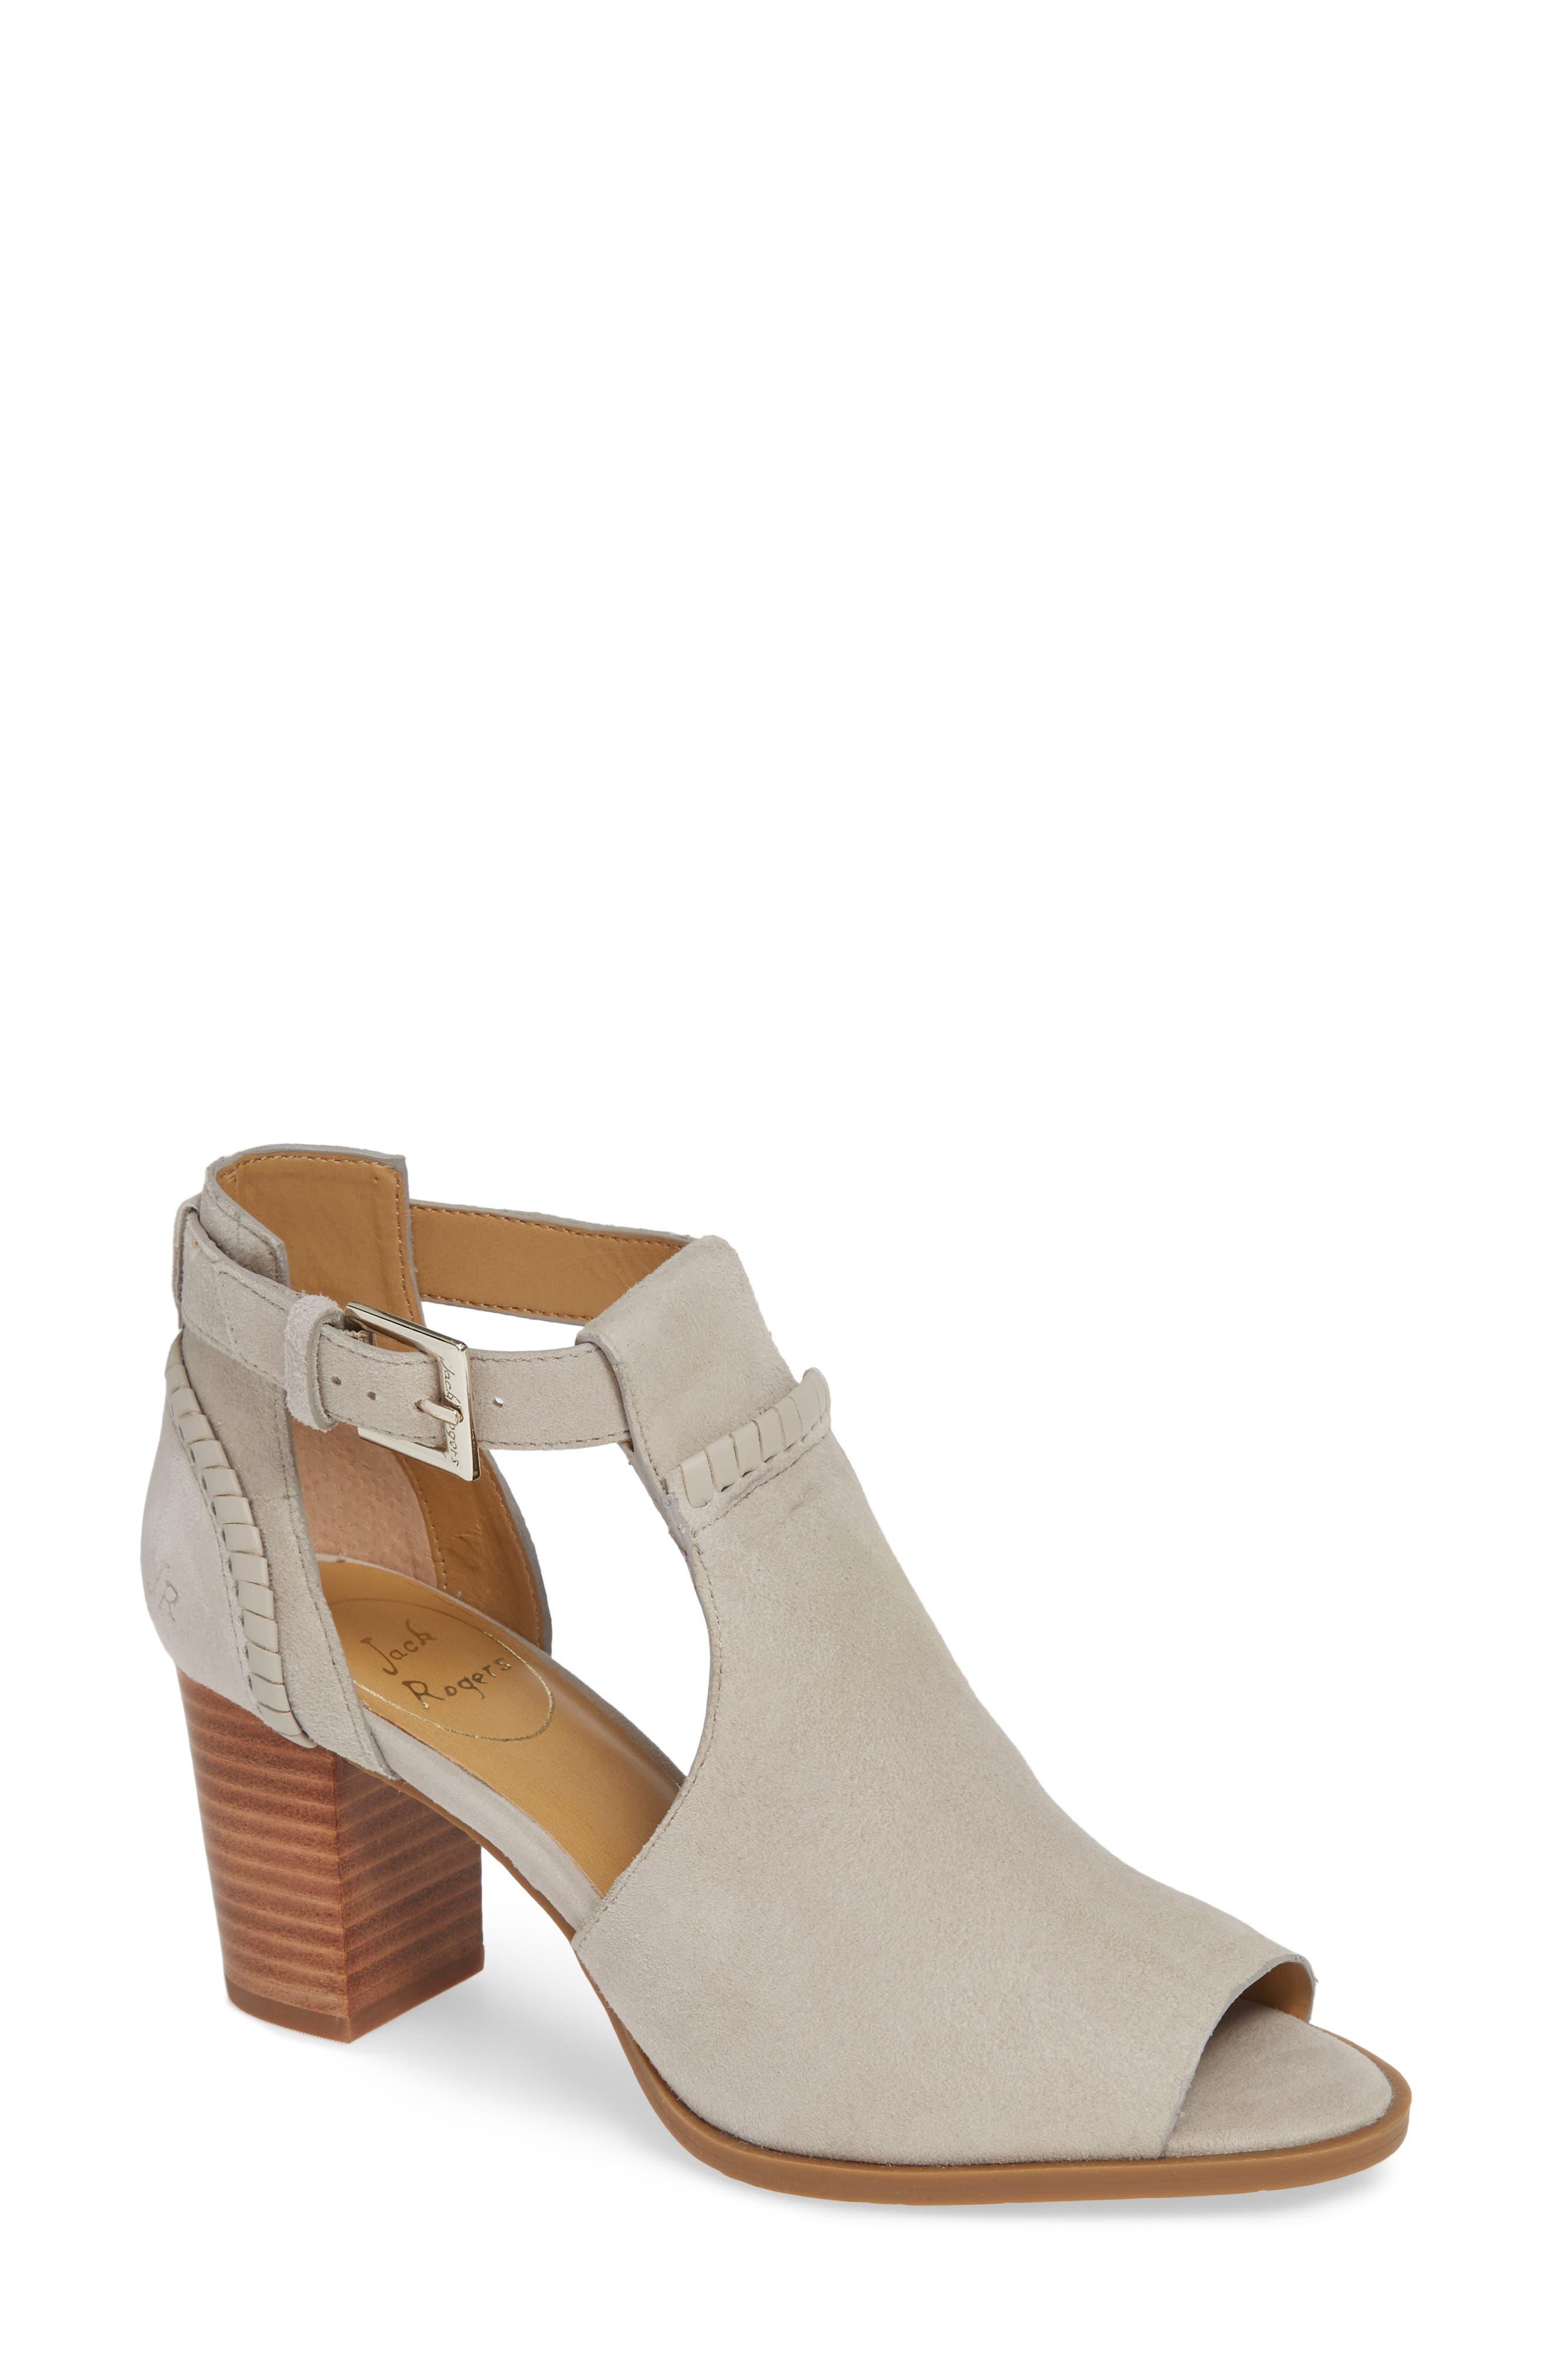 Cameron Block Heel Sandal,                             Main thumbnail 1, color,